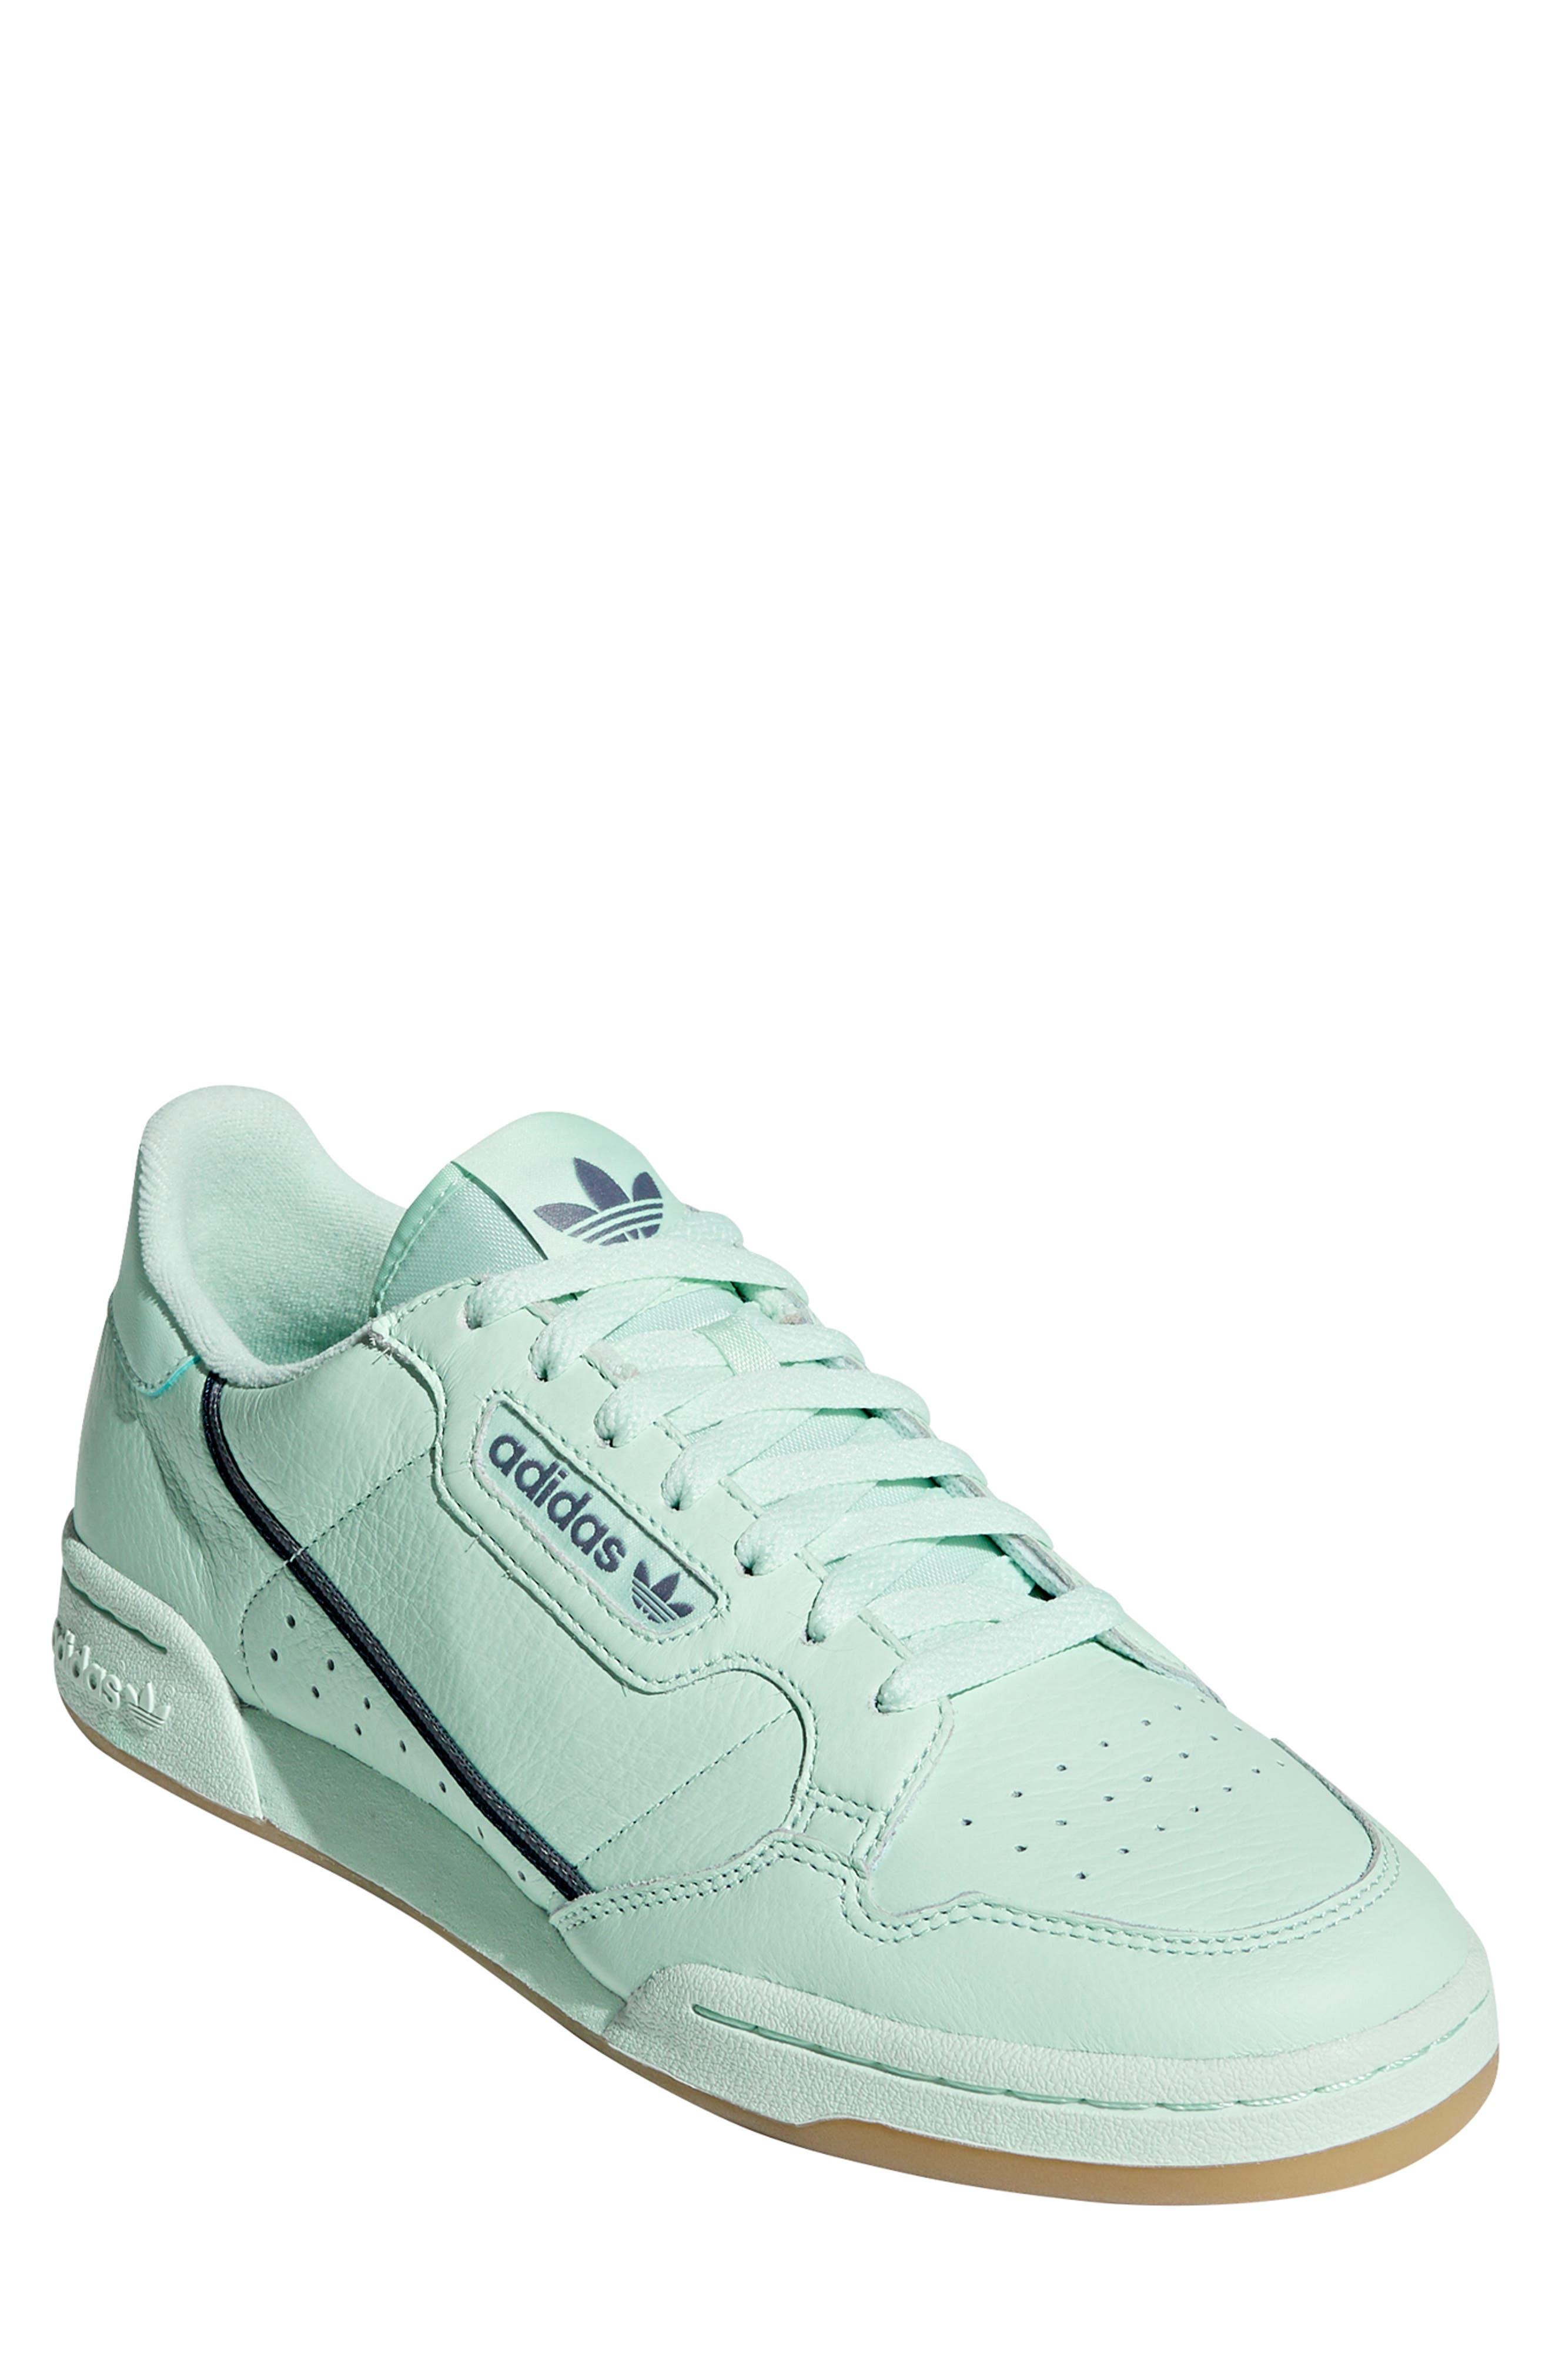 ADIDAS, Continental 80 Sneaker, Main thumbnail 1, color, ICE MINT/ NAVY/ GREY